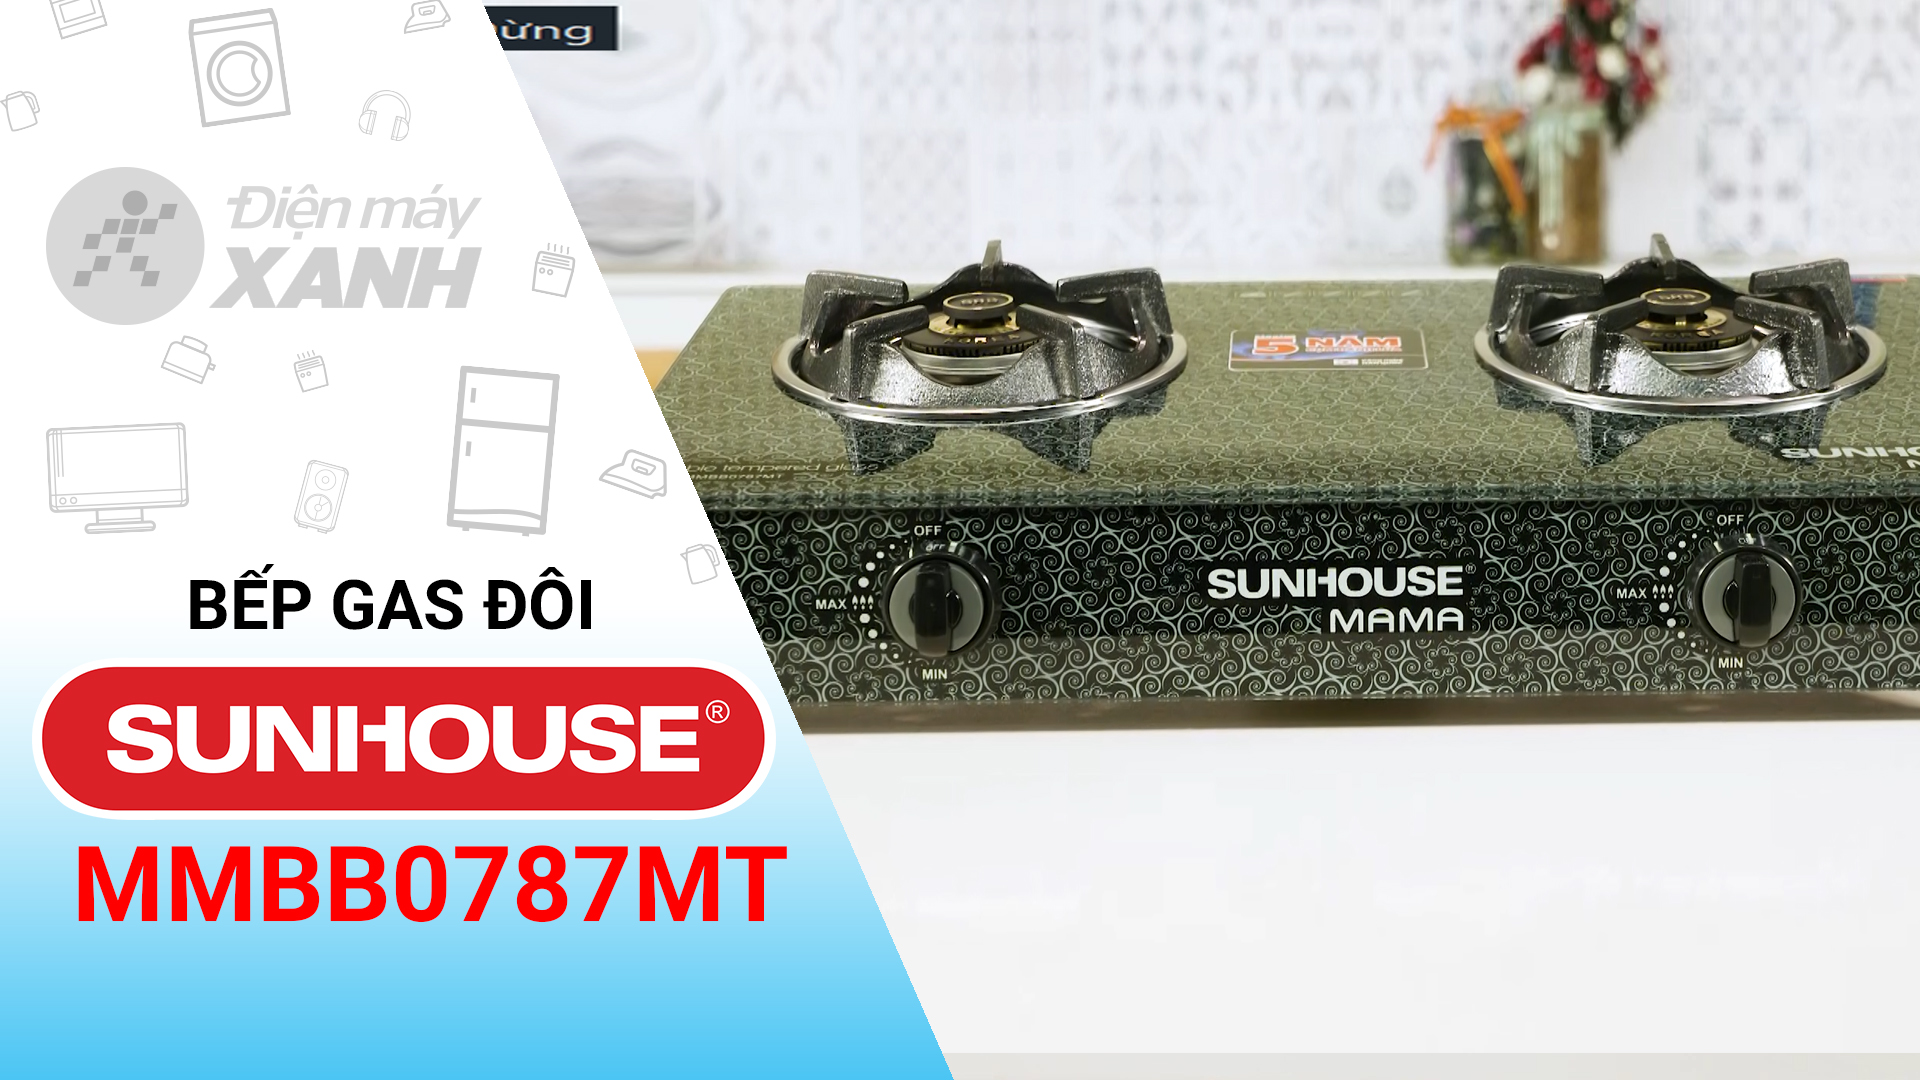 Bếp ga đôi Sunhouse Mama MMBB0787MT